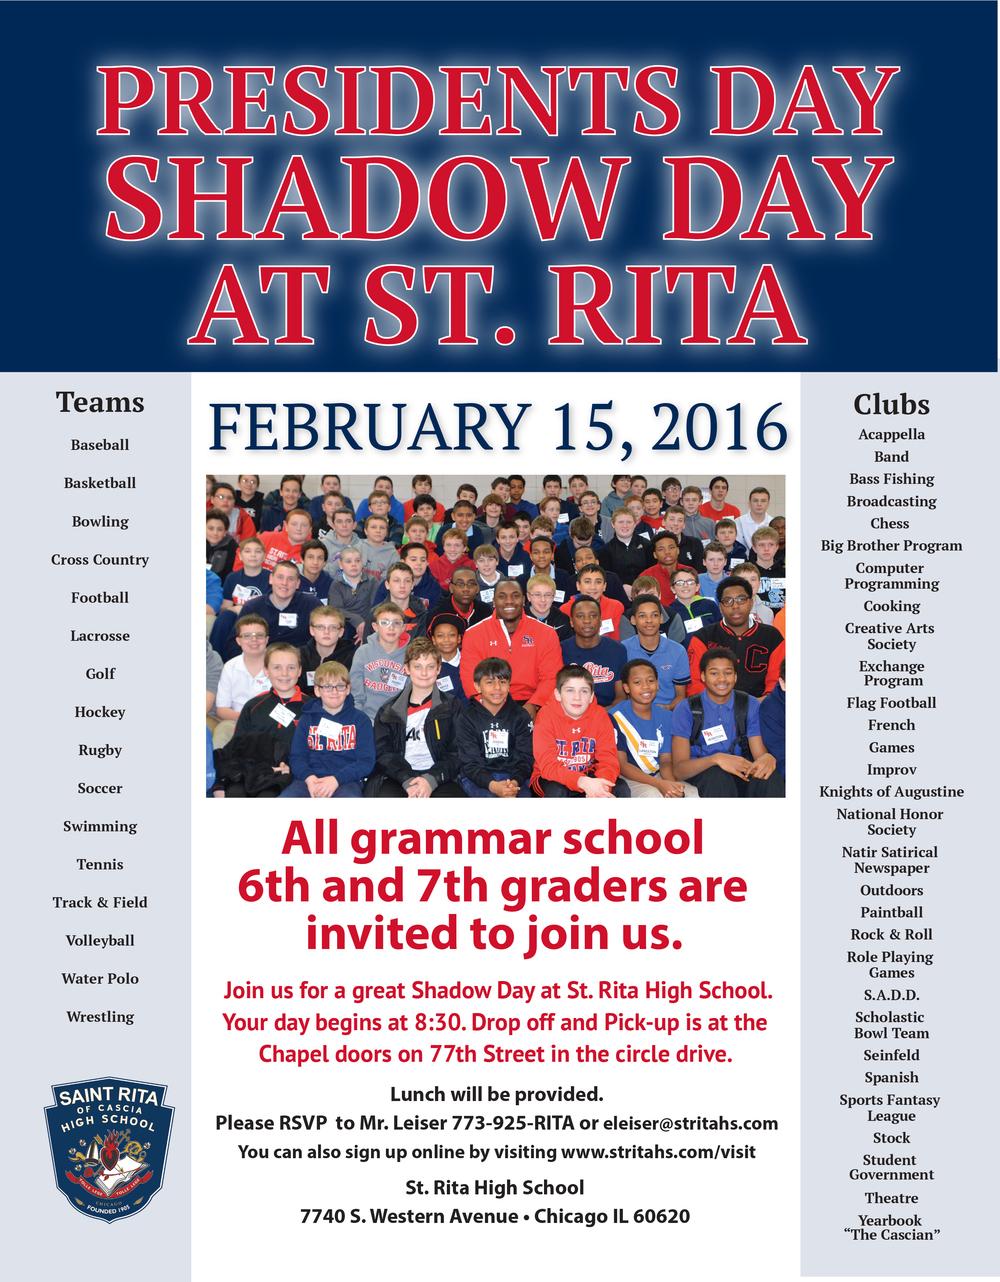 2016 President's Day Shadow Flyer.jpg